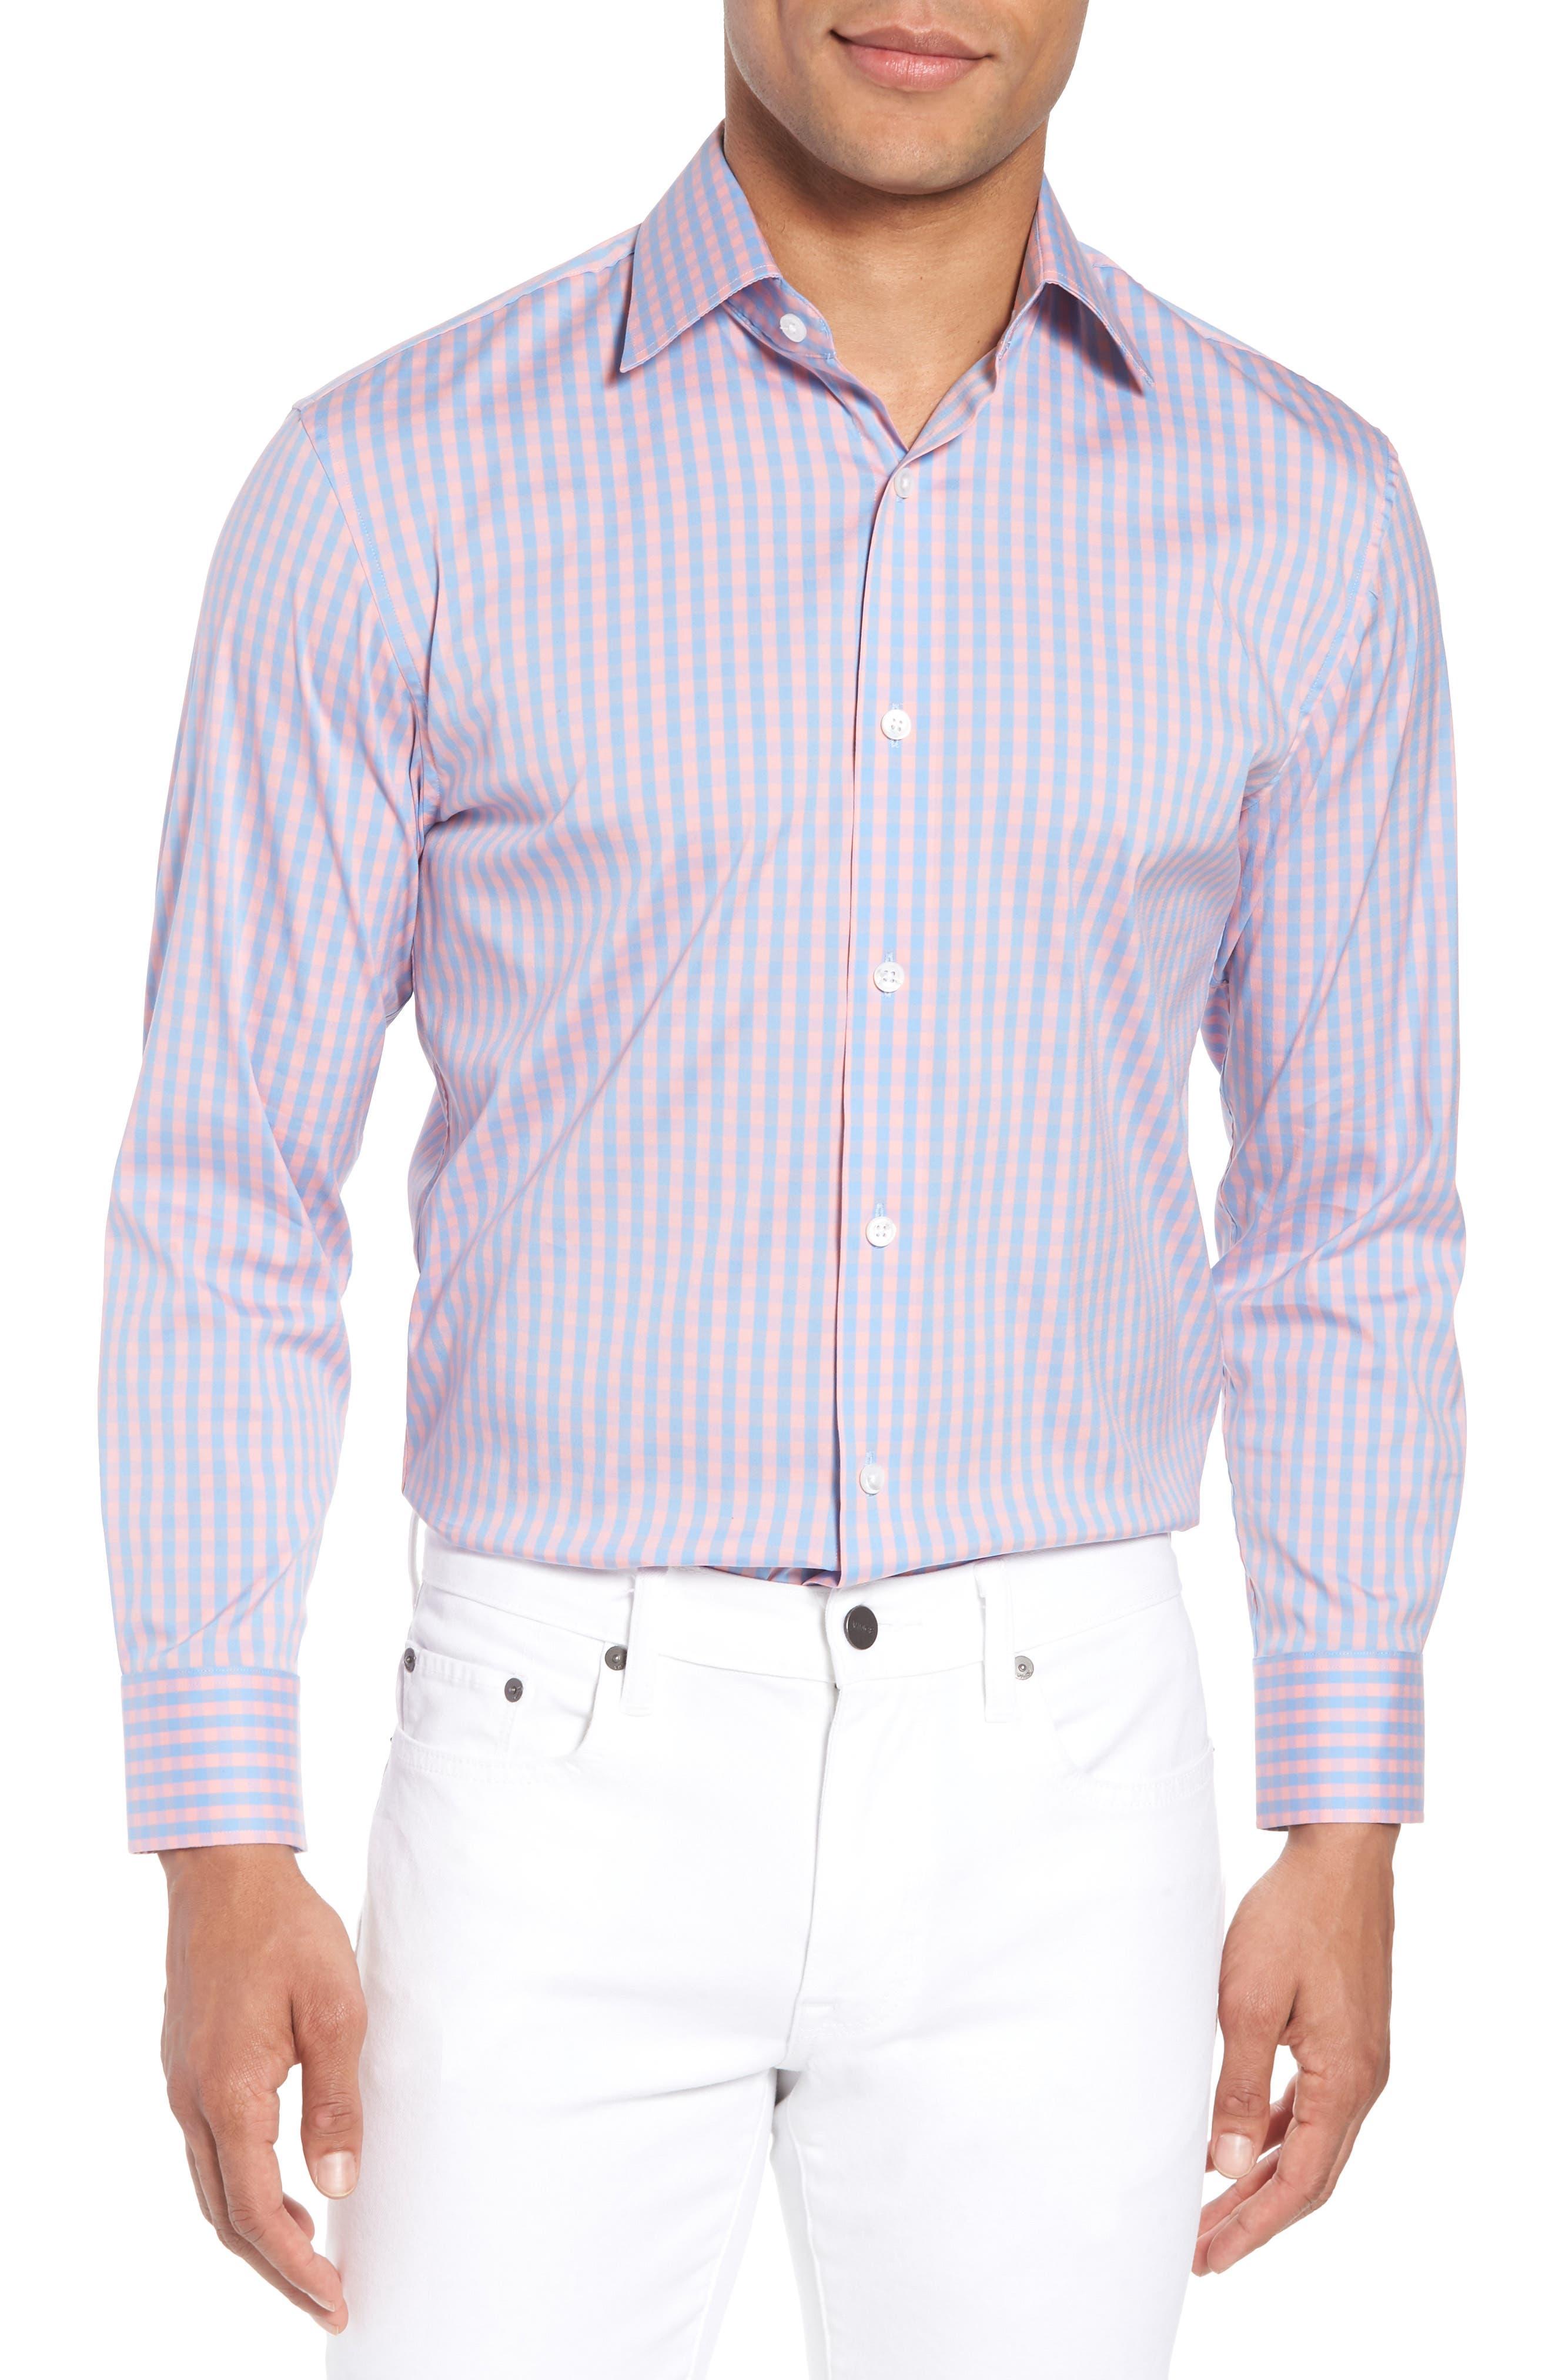 Jetsetter Slim Fit Stretch Check Dress Shirt,                             Main thumbnail 1, color,                             650